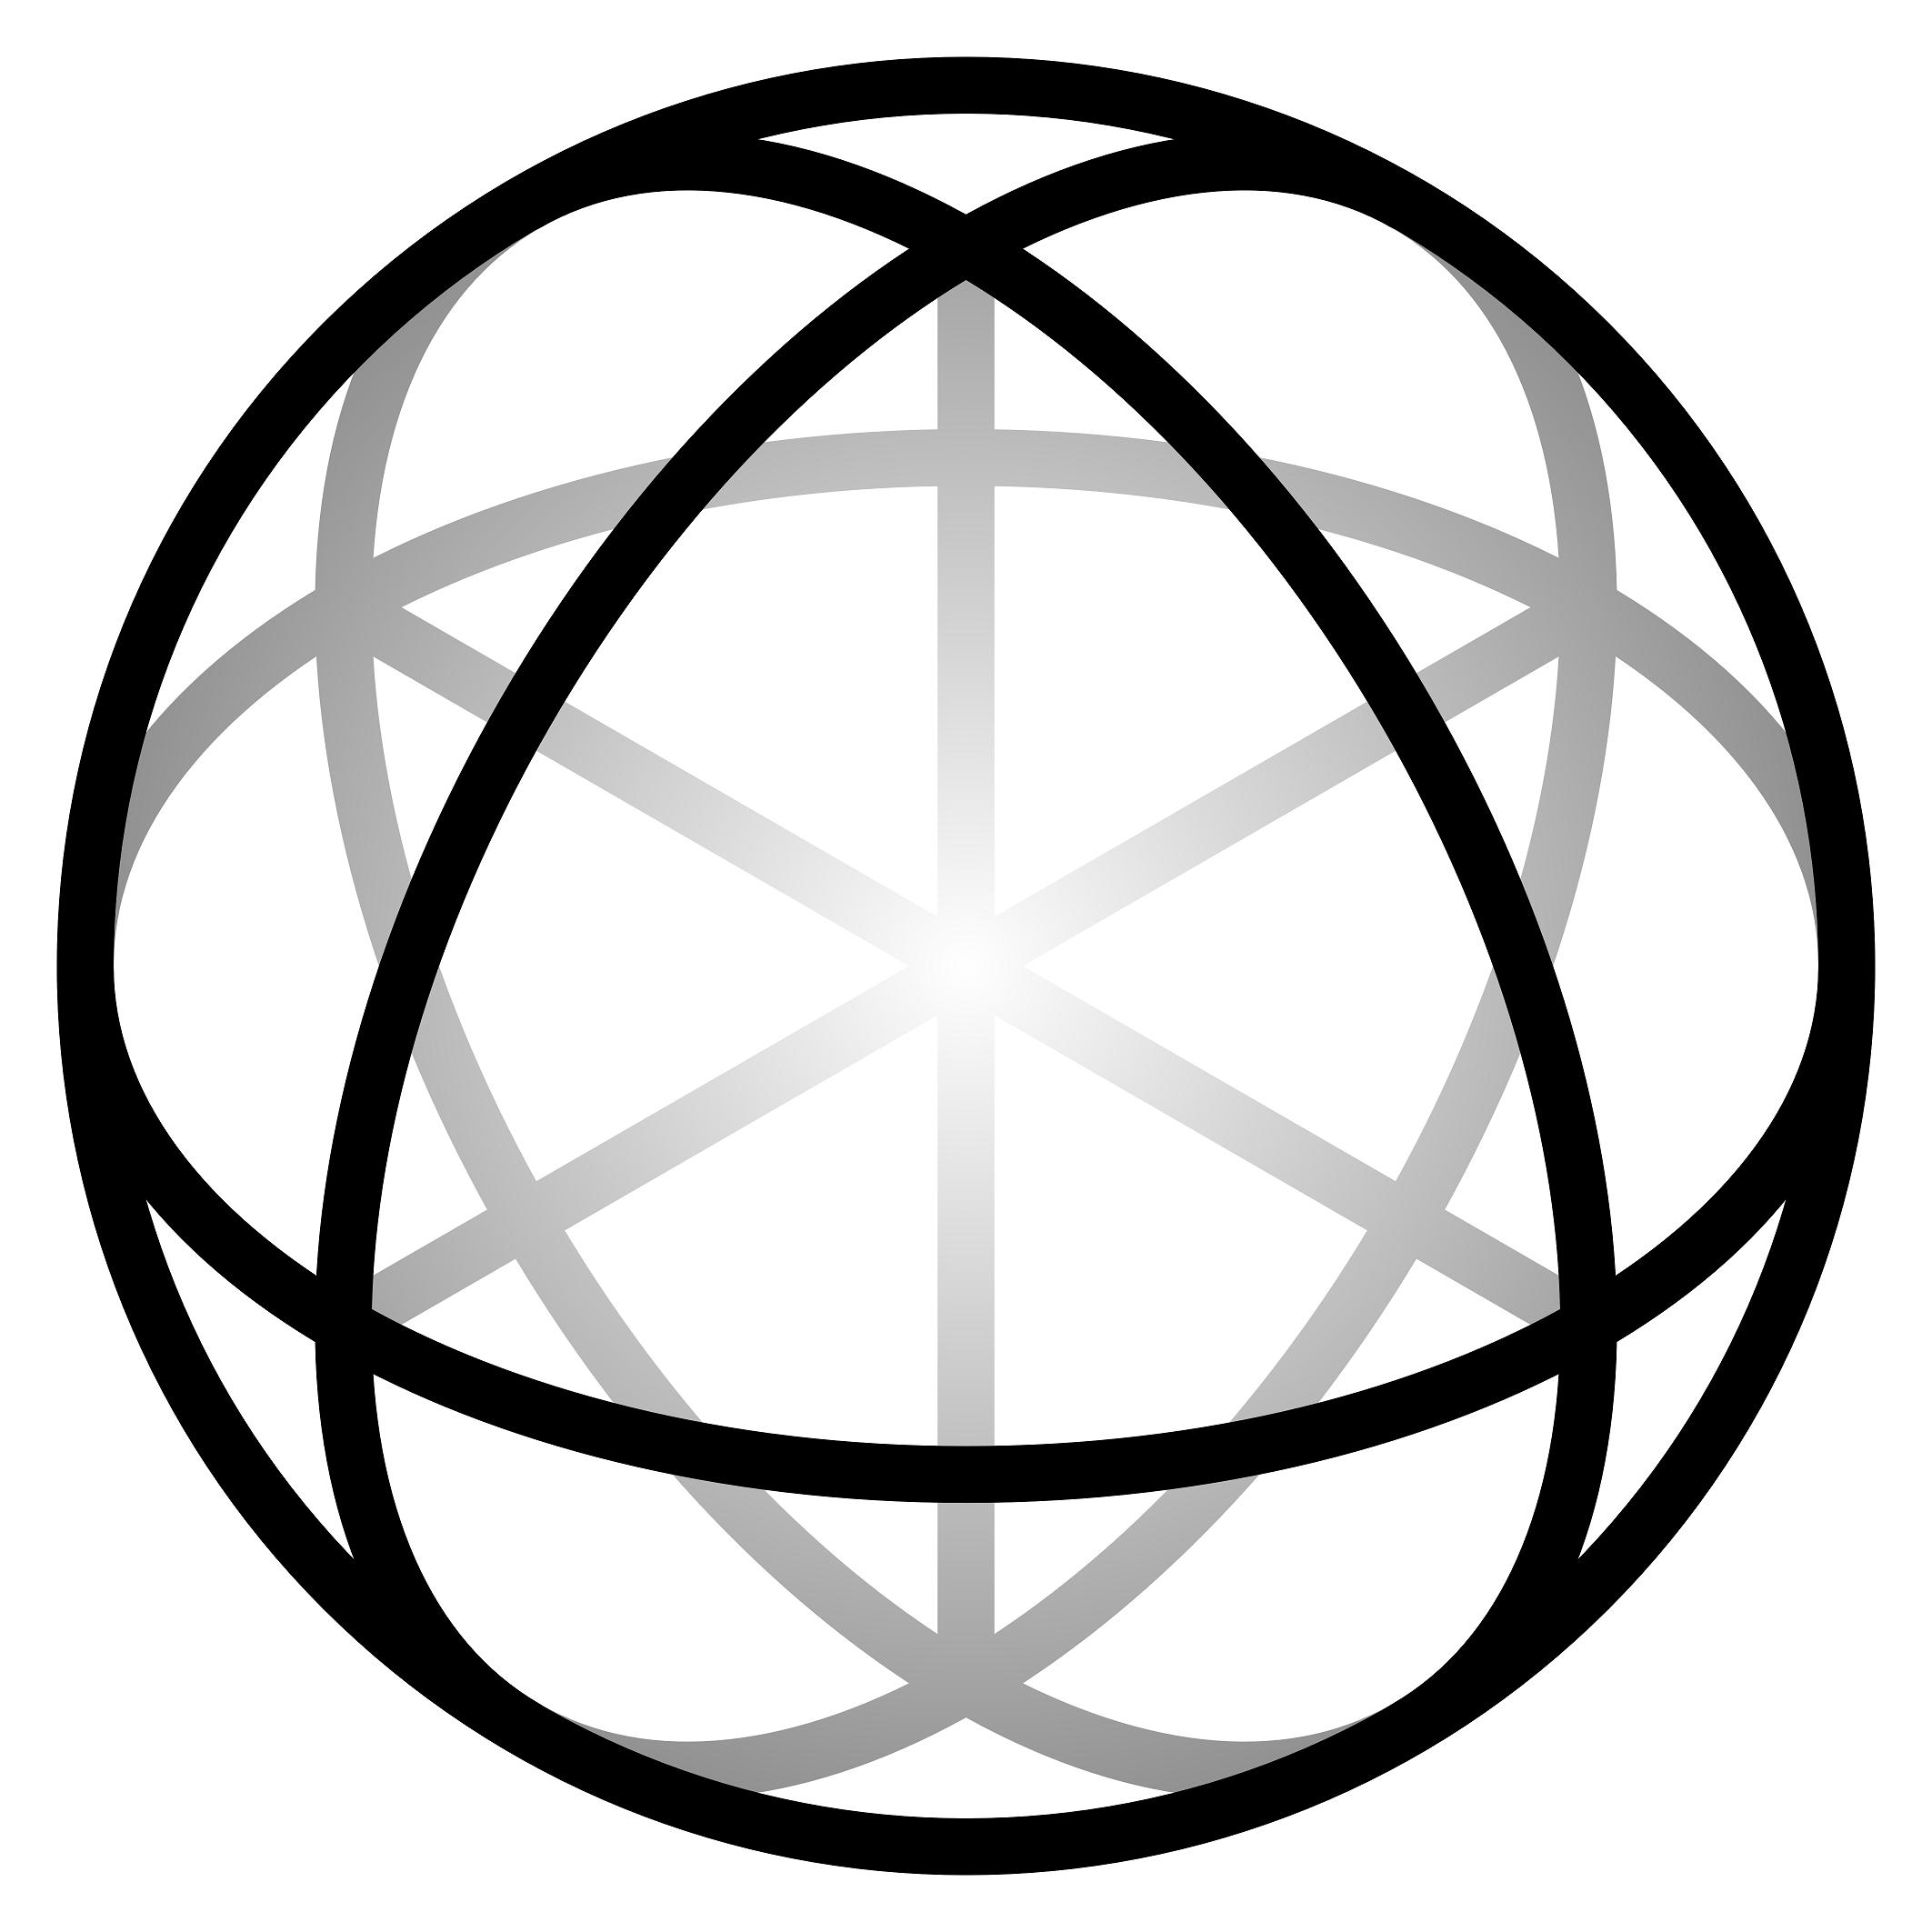 Symbol of Deiwos, a Pagan religion. http://www.deiwos.org/